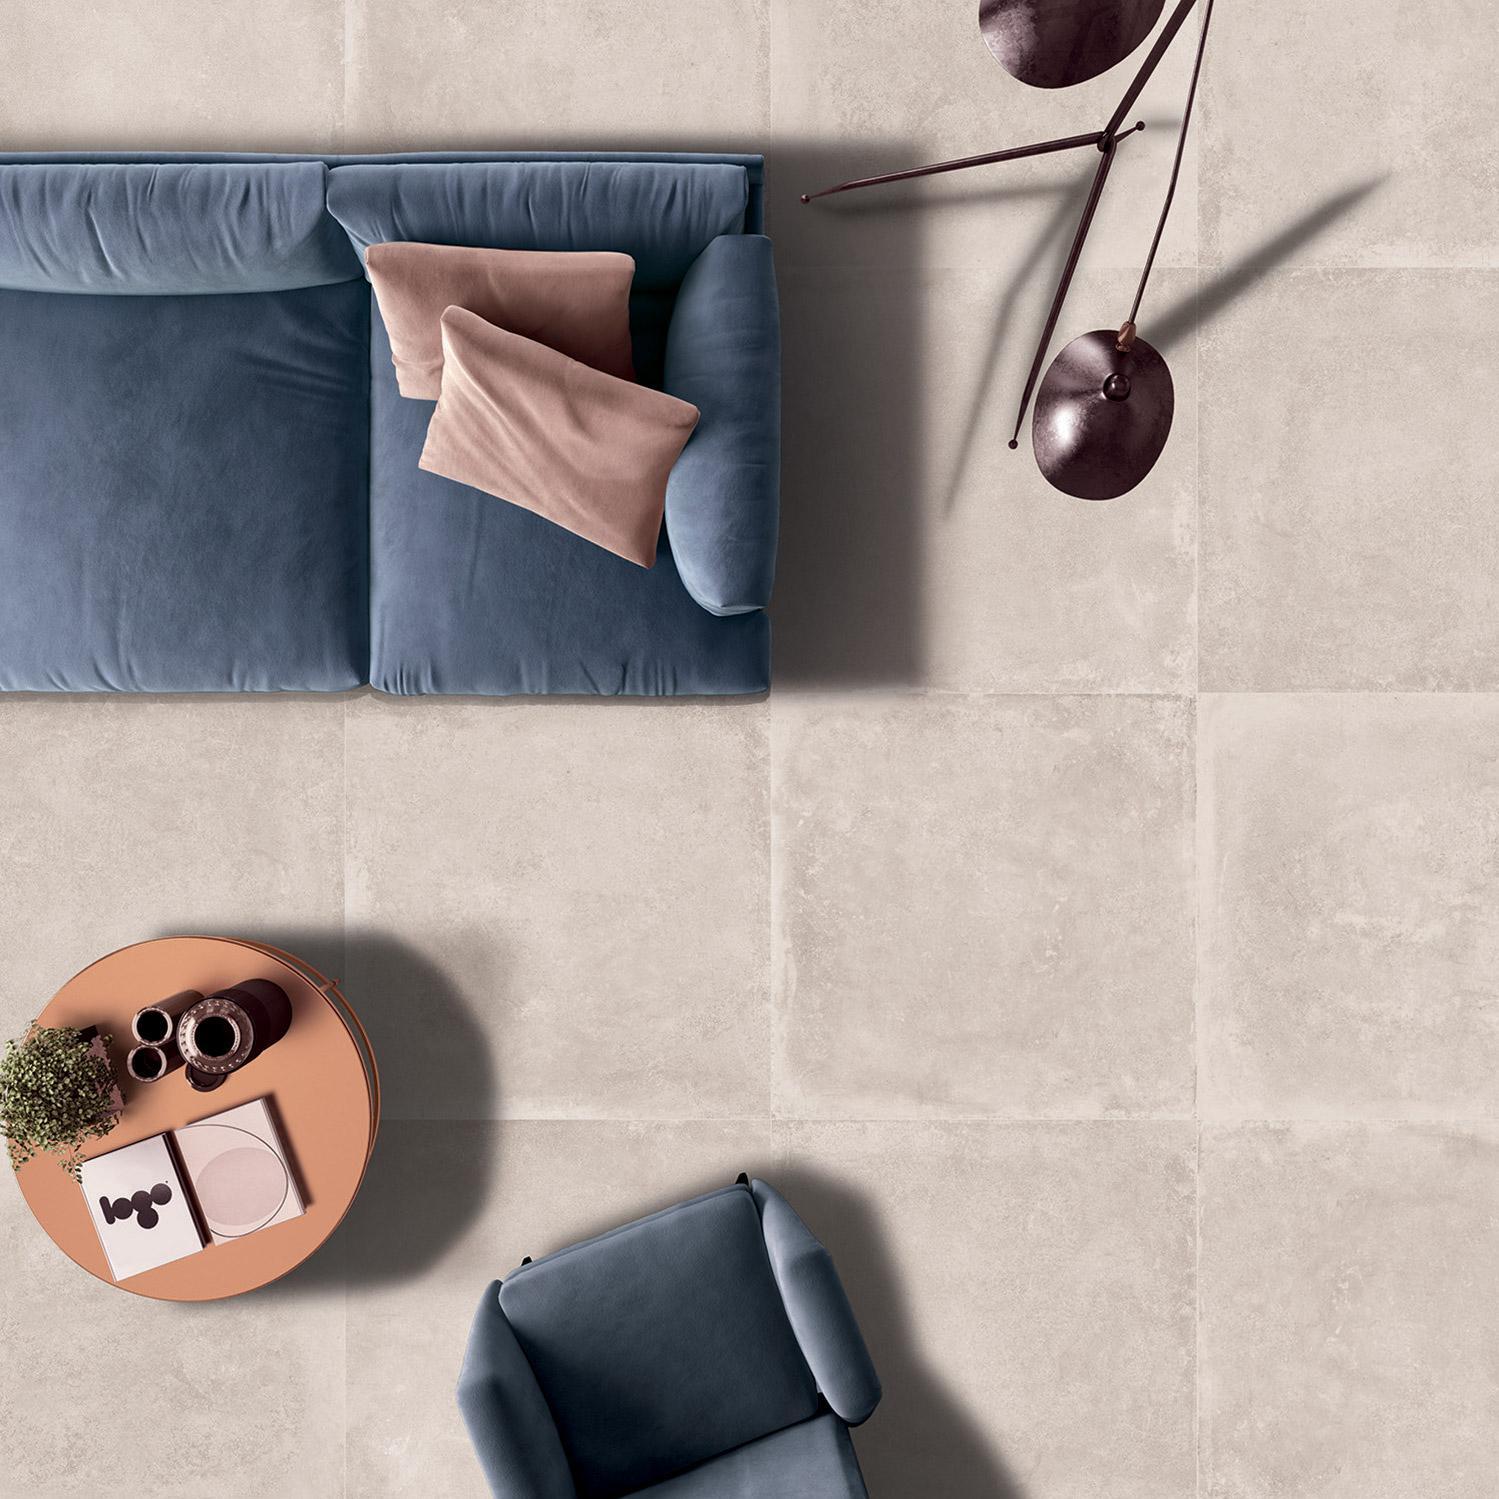 Carrelage sol et mur intenso grège 0003579 l.80 x L.80 cm EXCELLENCE - ARIANA GR